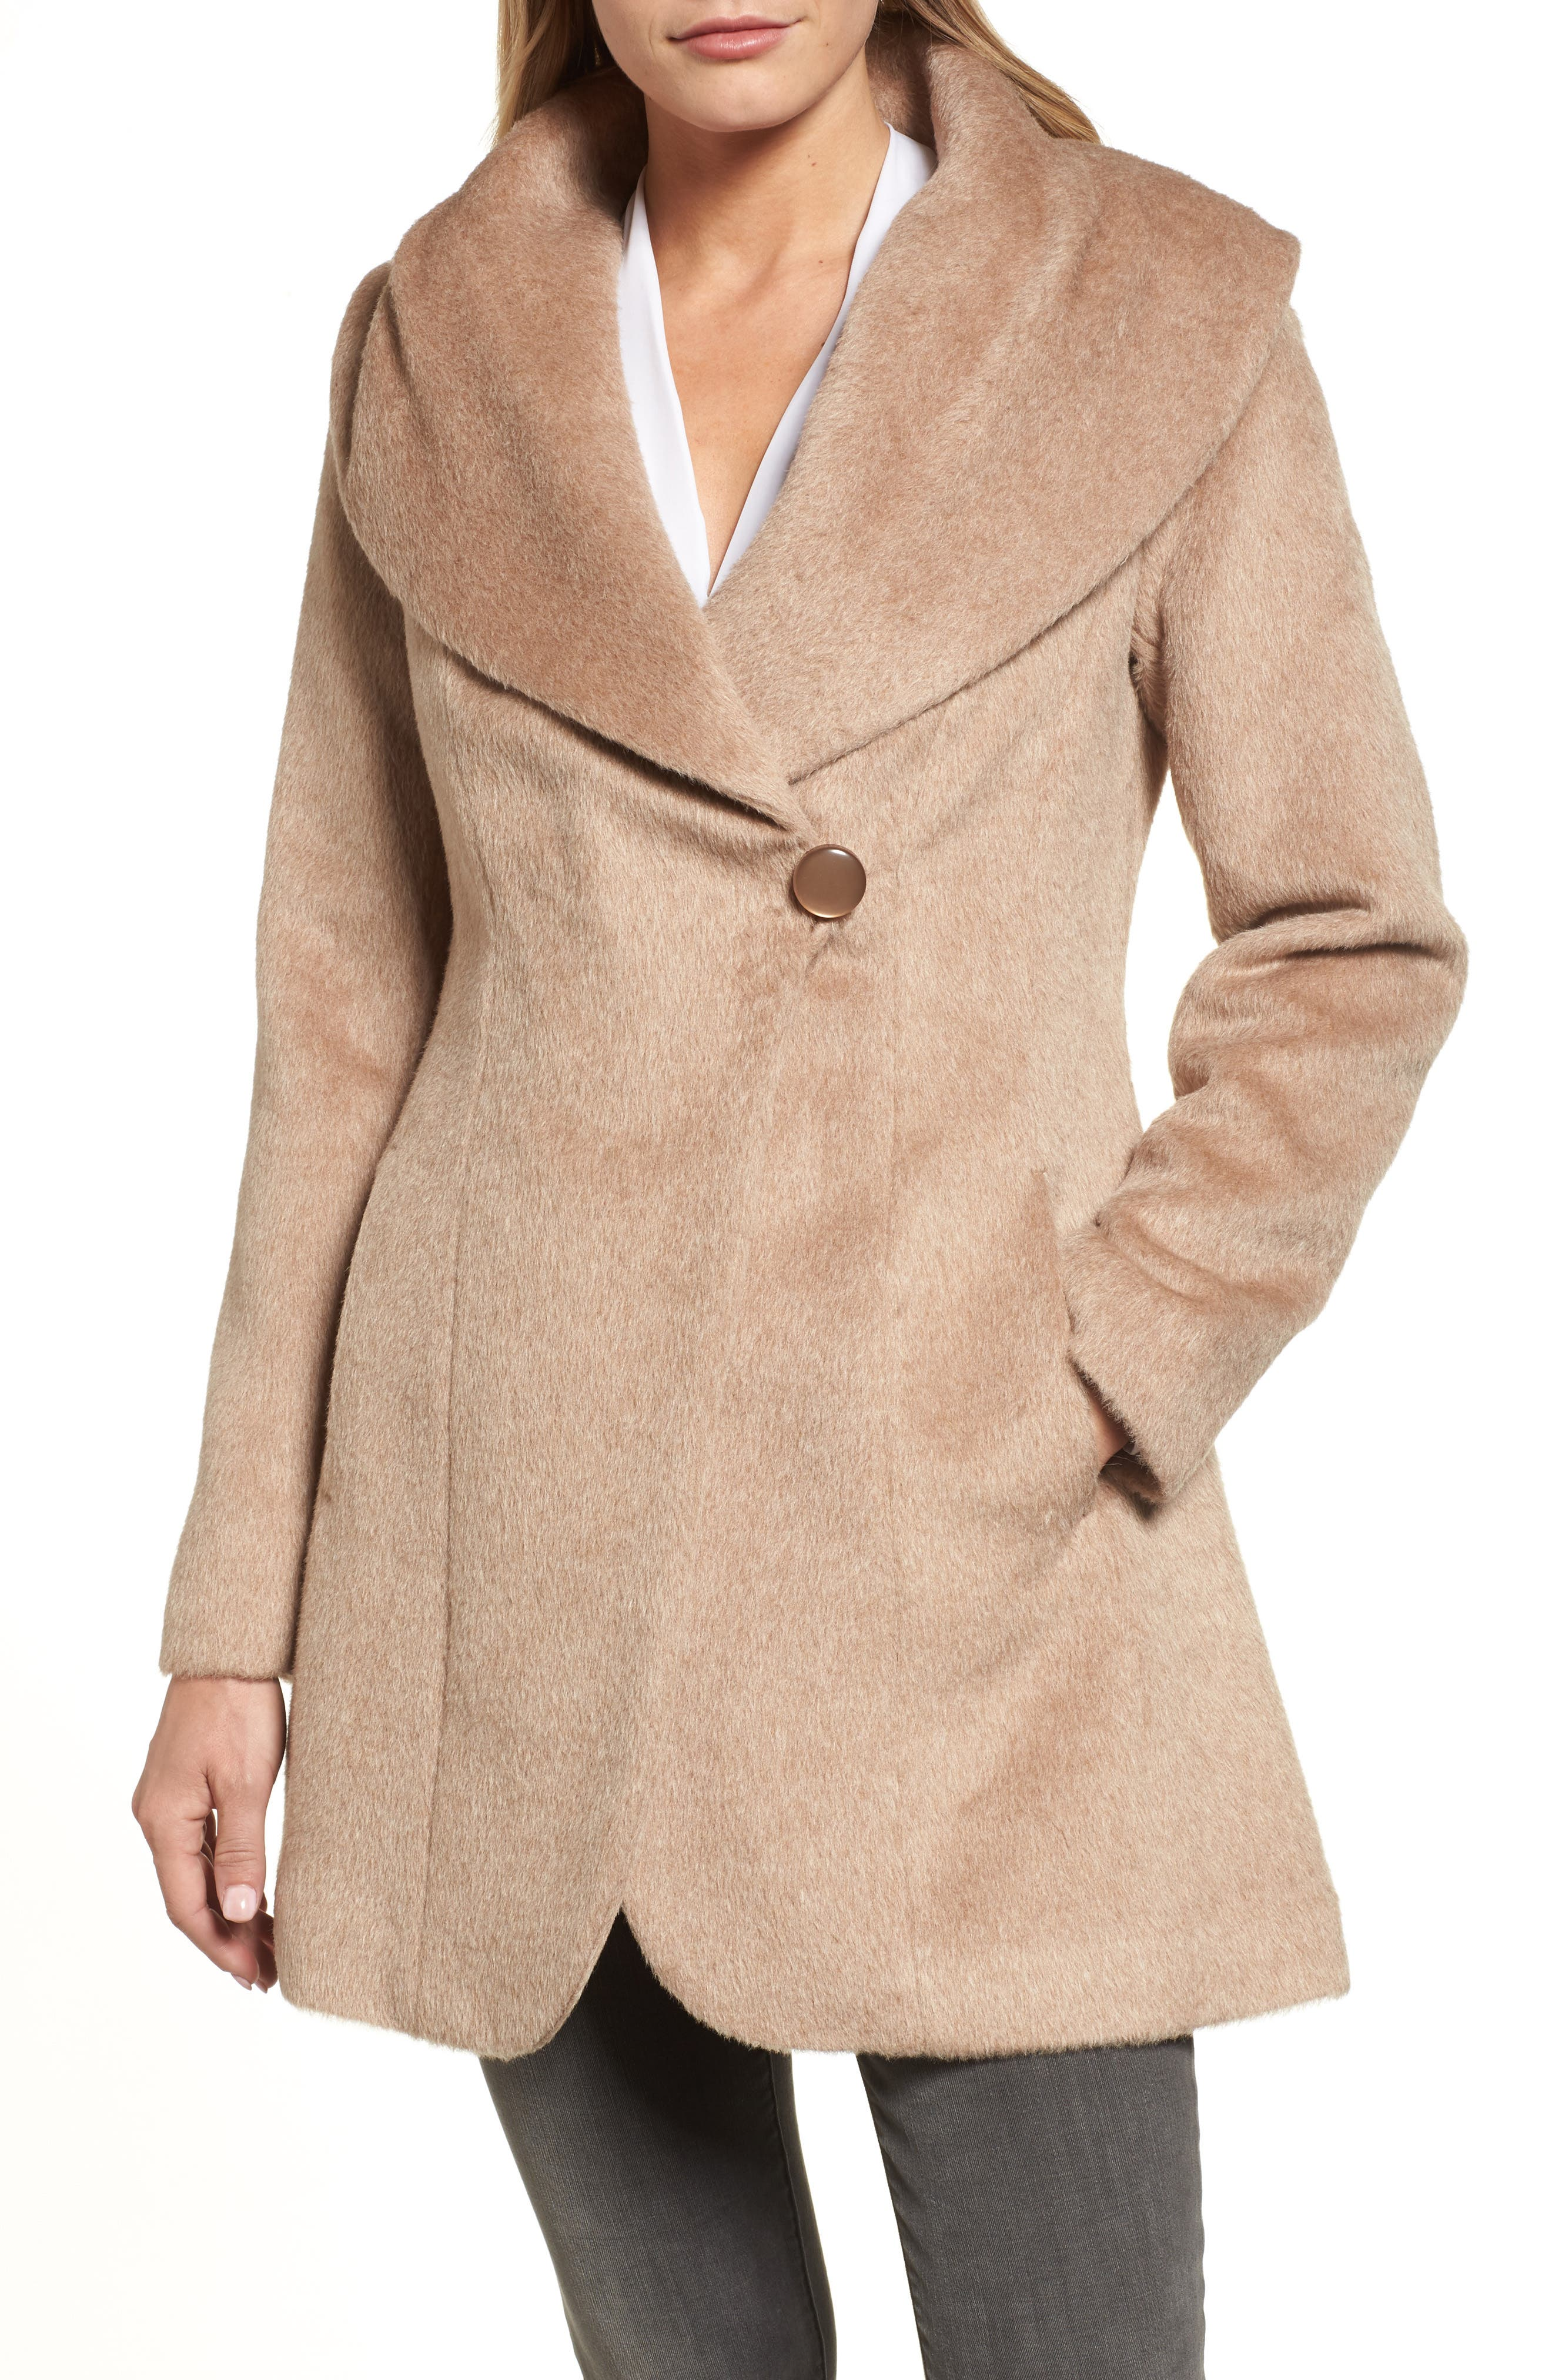 Main Image - Trina Turk Jemma Shawl Collar Coat (Regular & Petite)